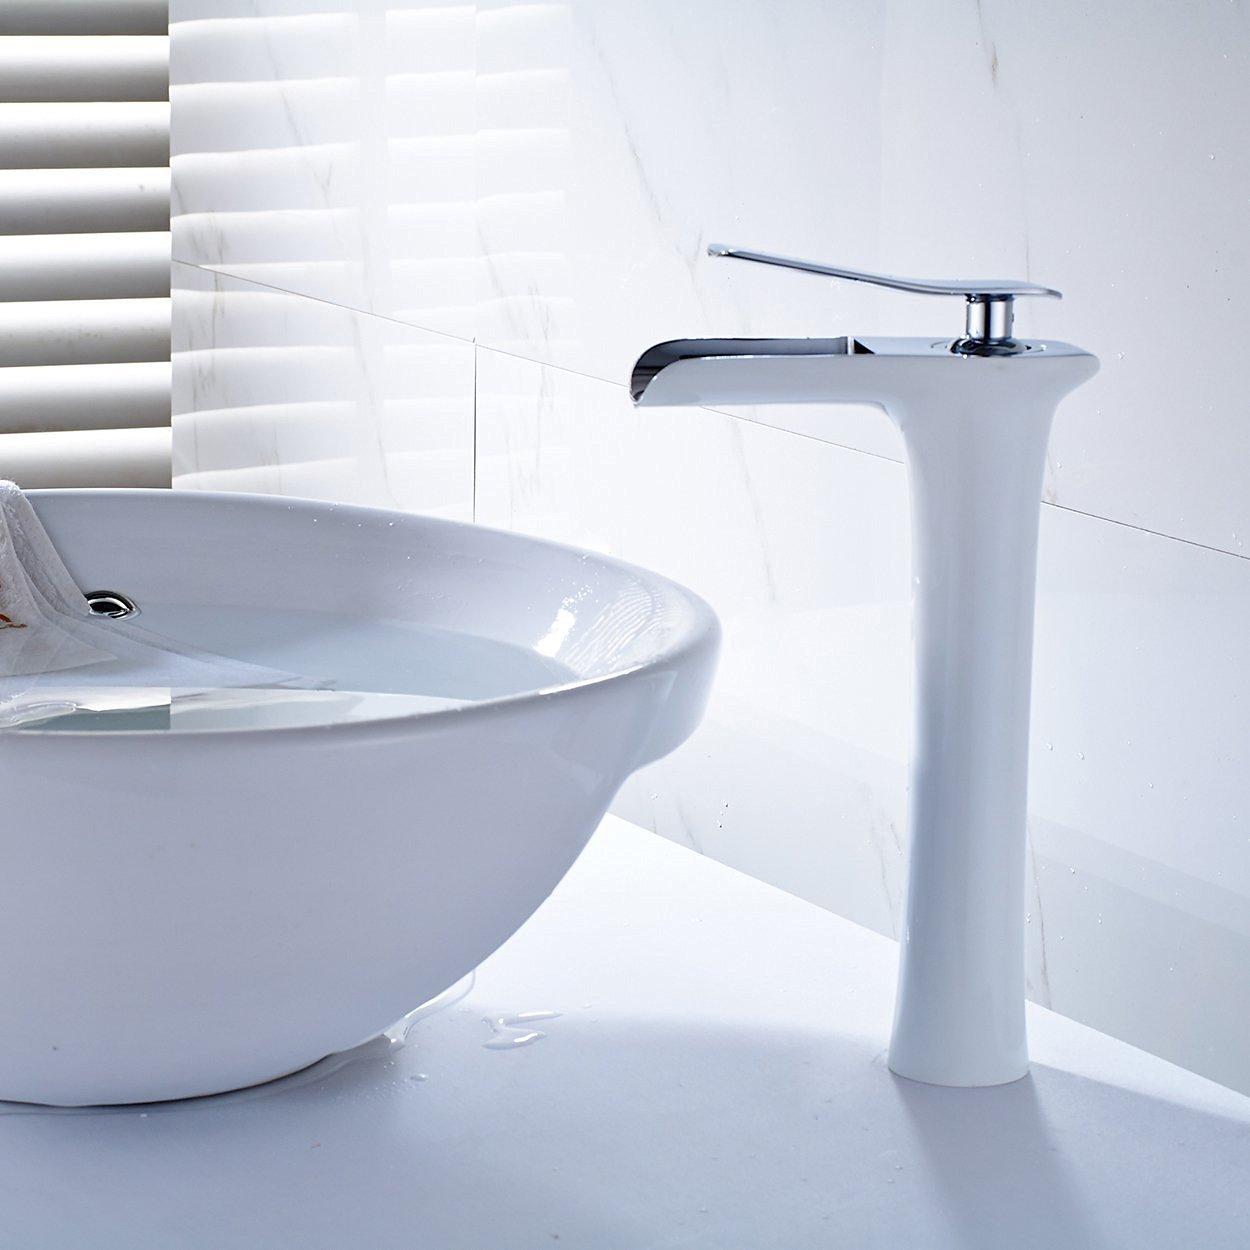 Oxydation Salle De Bain ~ fapully robinet salle de bain mitigeur lavabo blanc amazon fr